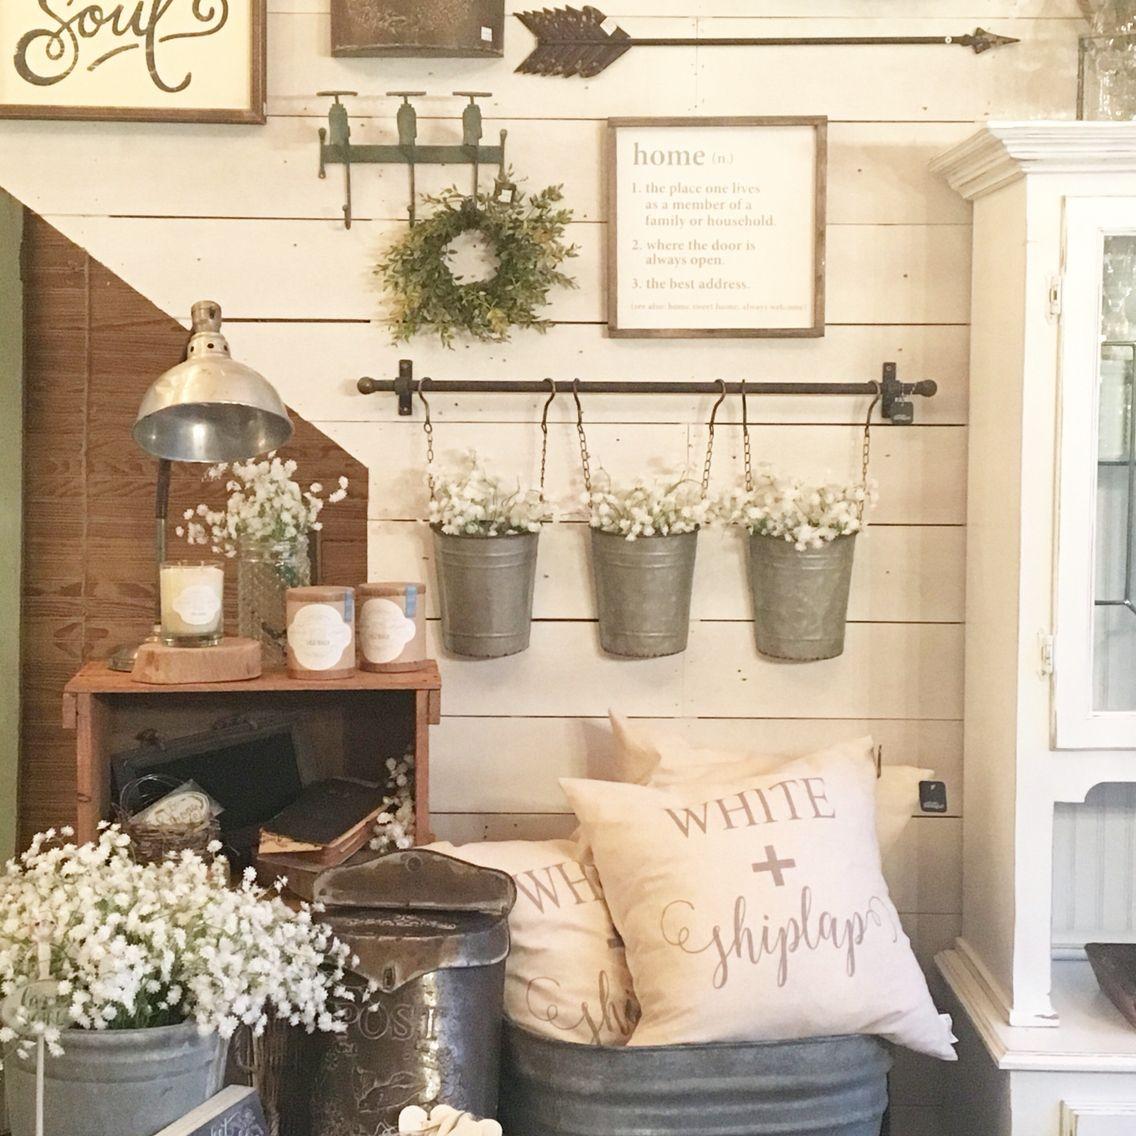 27 rustic wall decor ideas to turn shabby into fabulous farmhouse wall decor rustic farmhouse on kitchen decor wall ideas id=82410